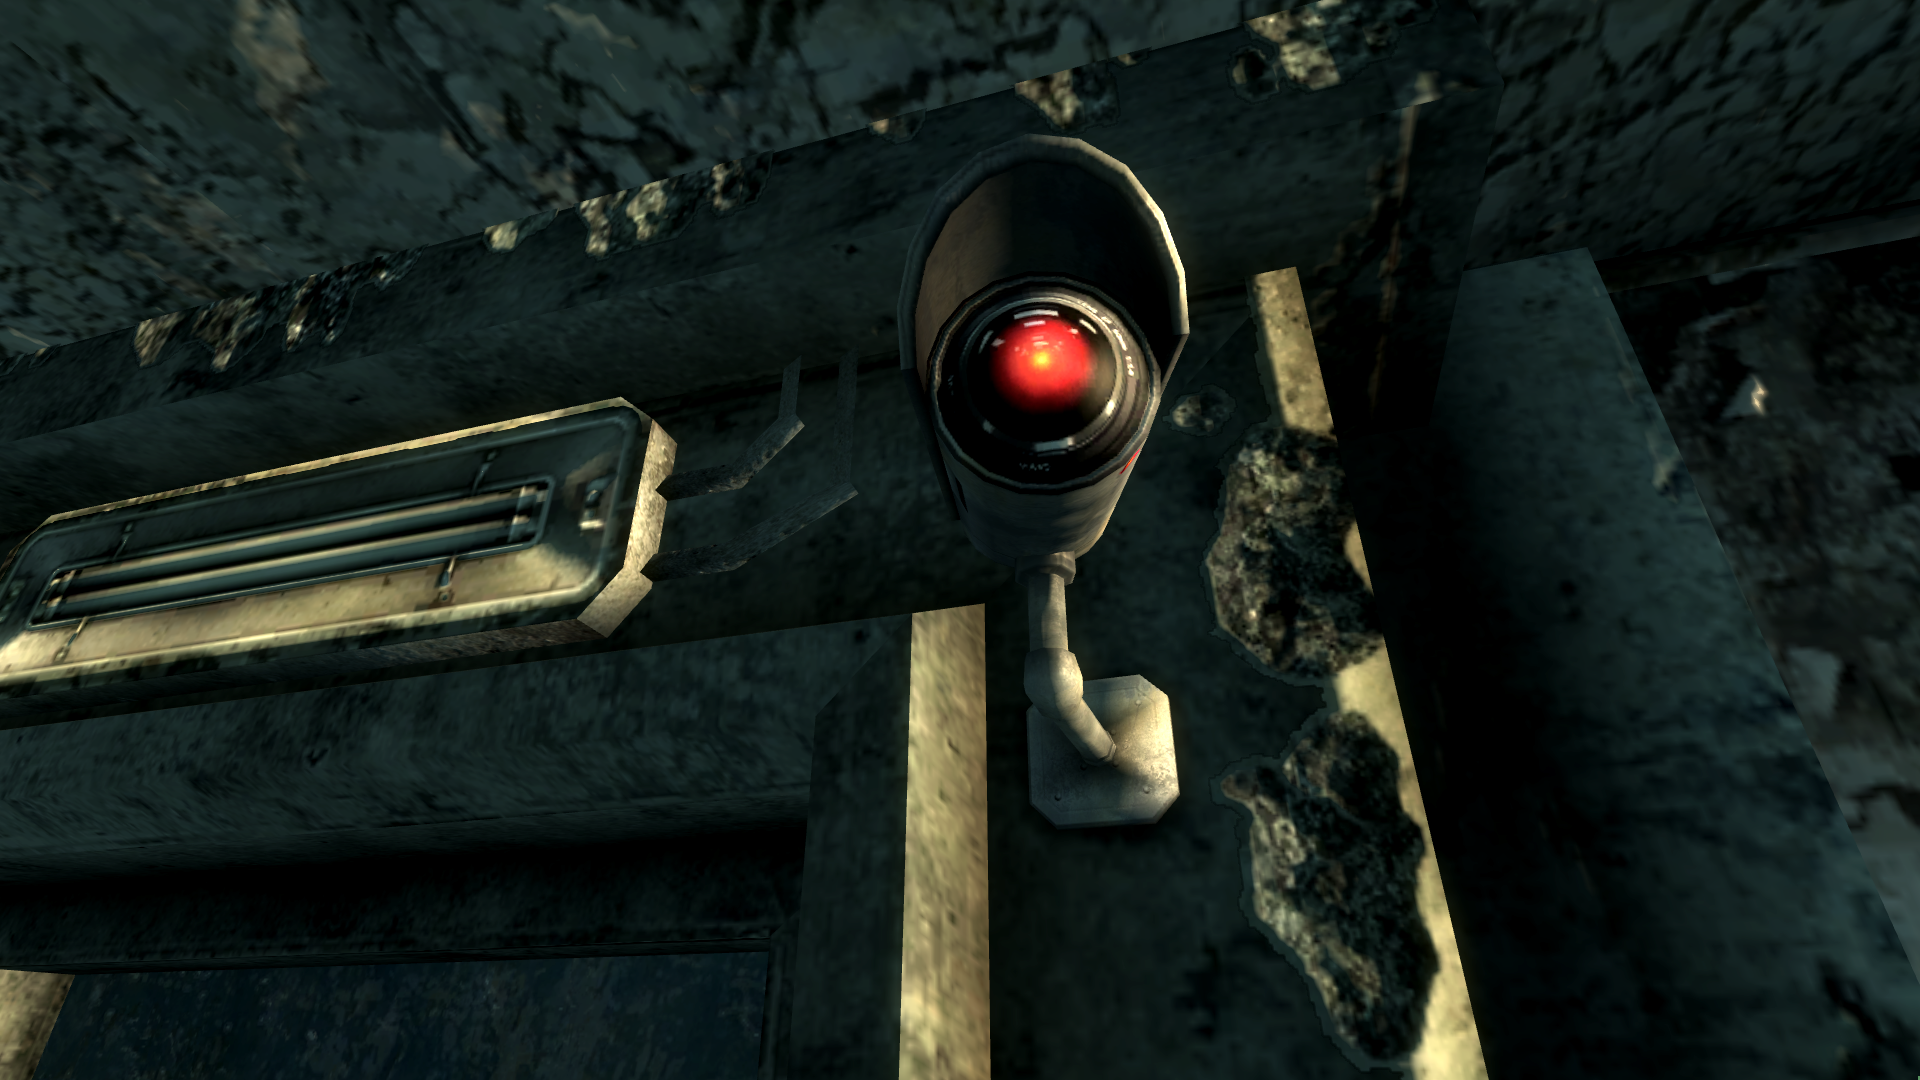 Fallout 3 cultural references | Fallout Wiki | FANDOM